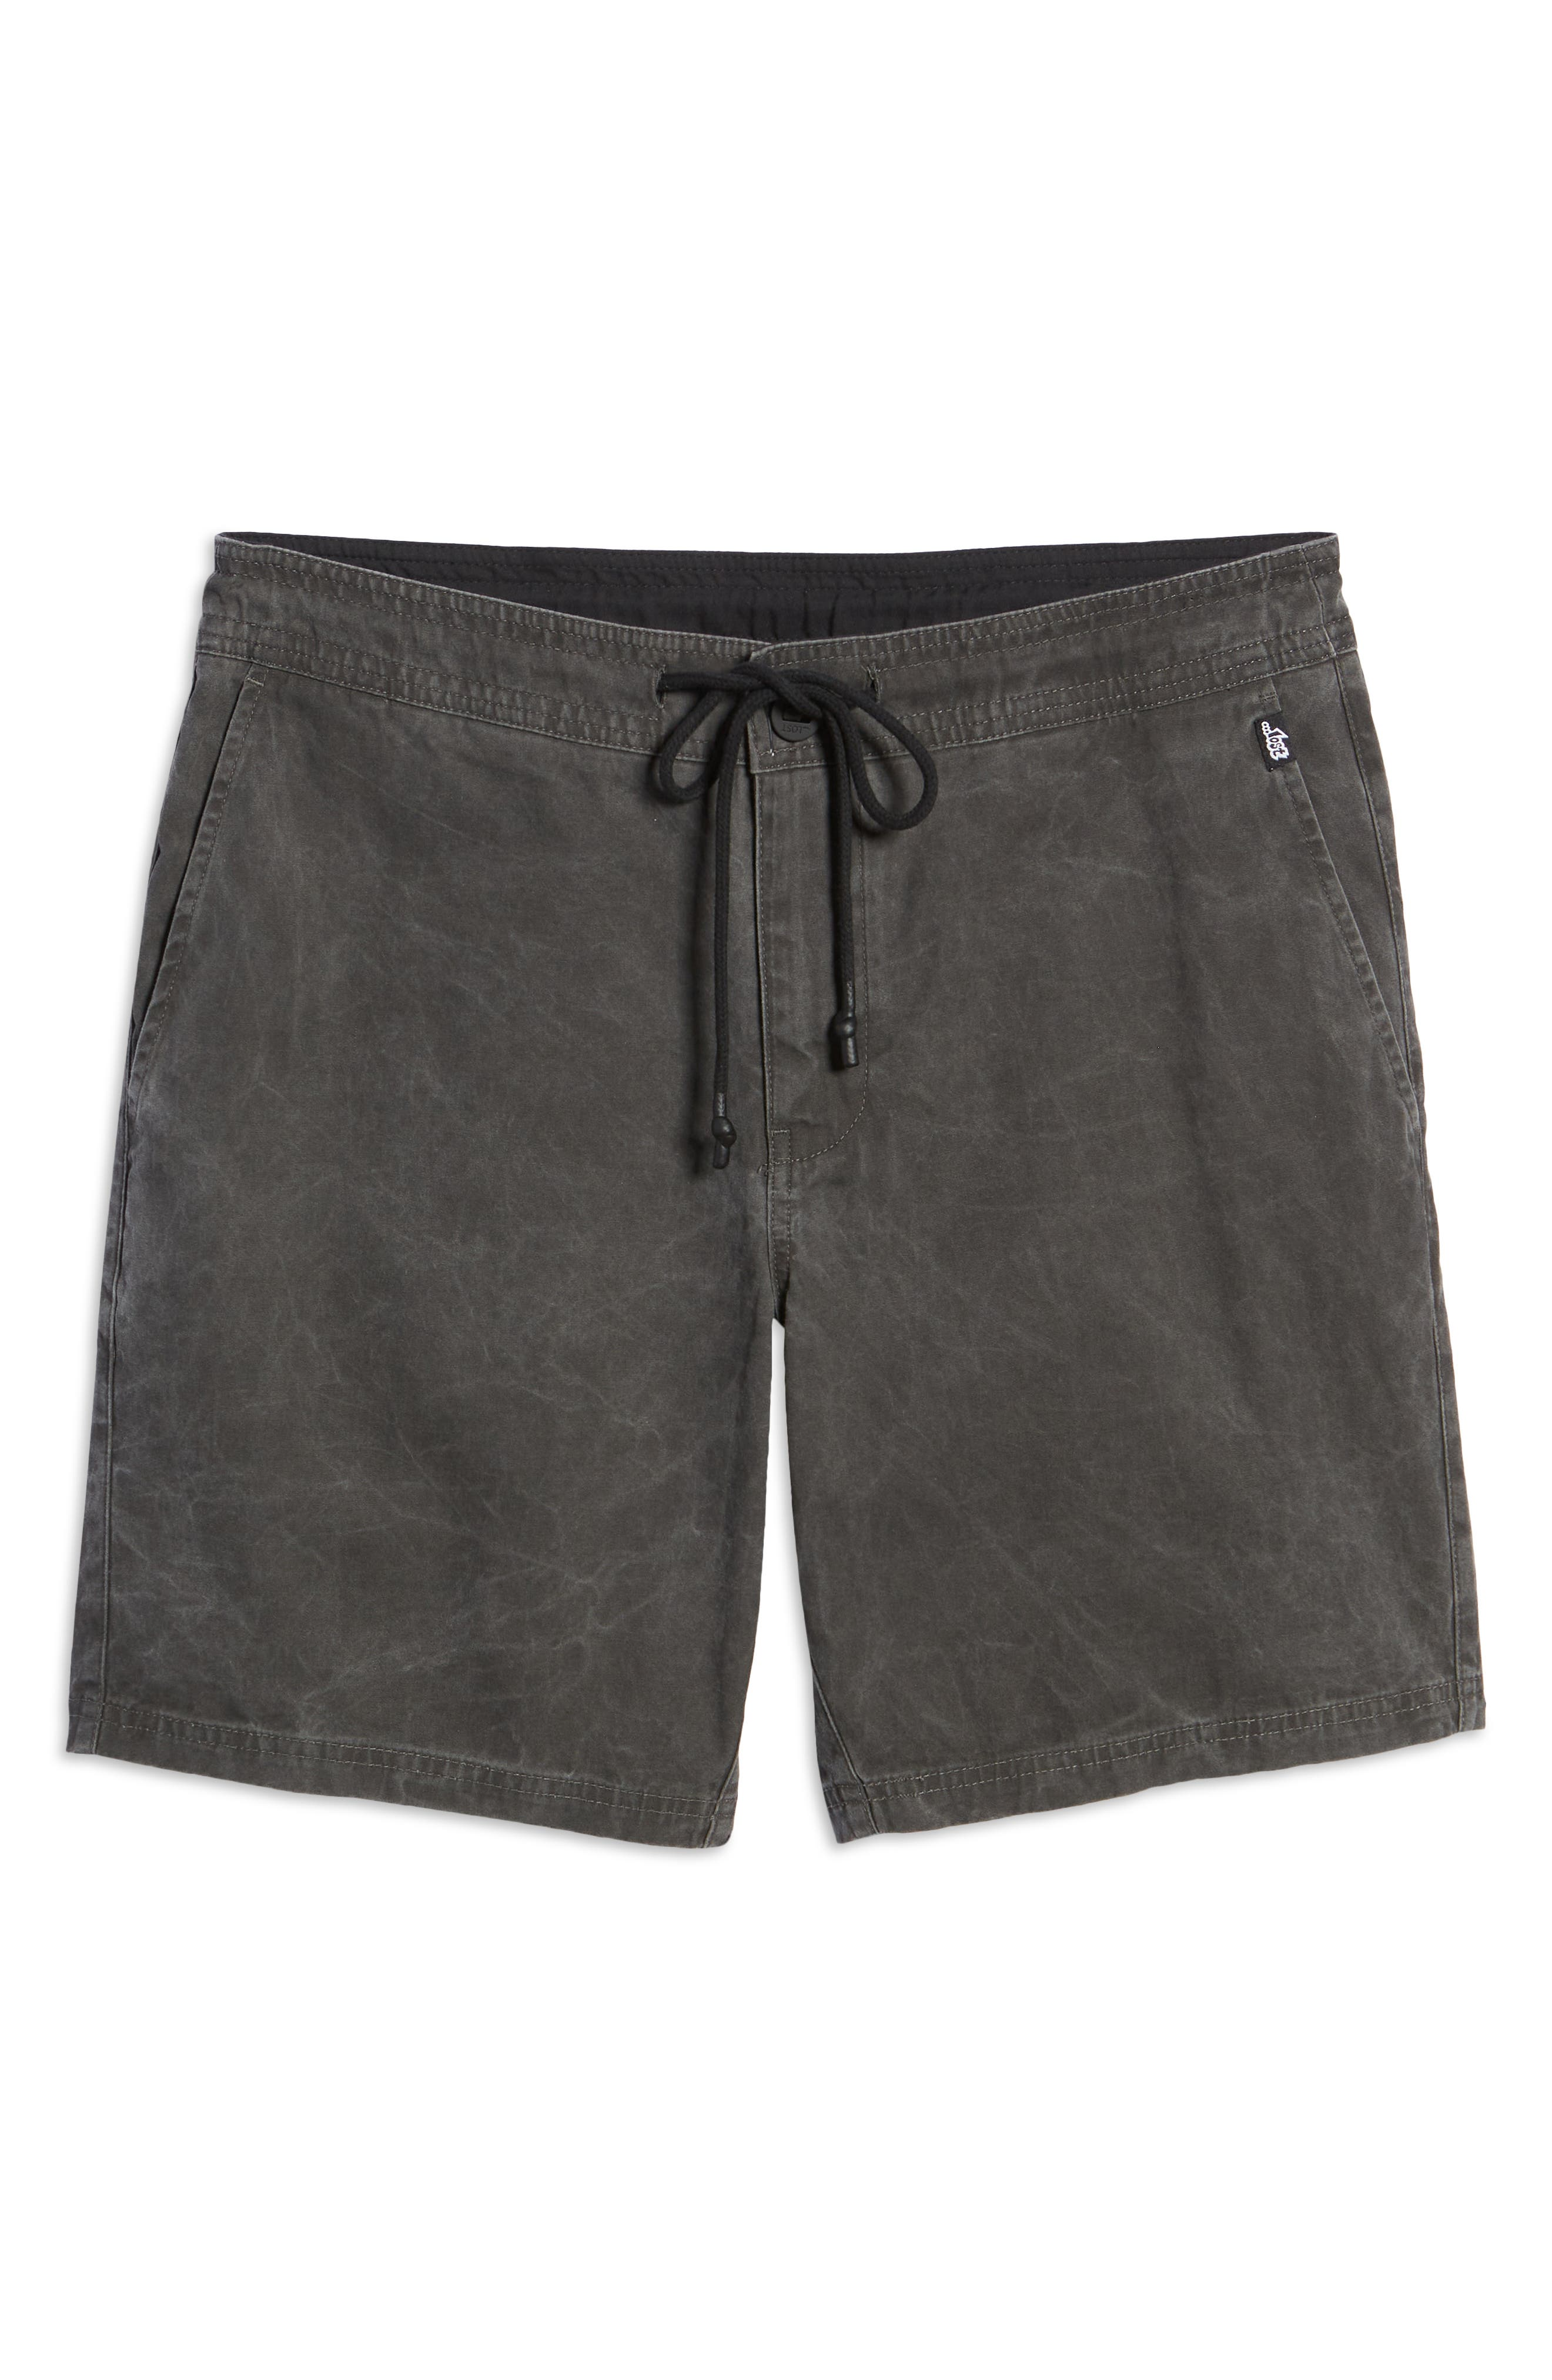 Surge Walk Shorts